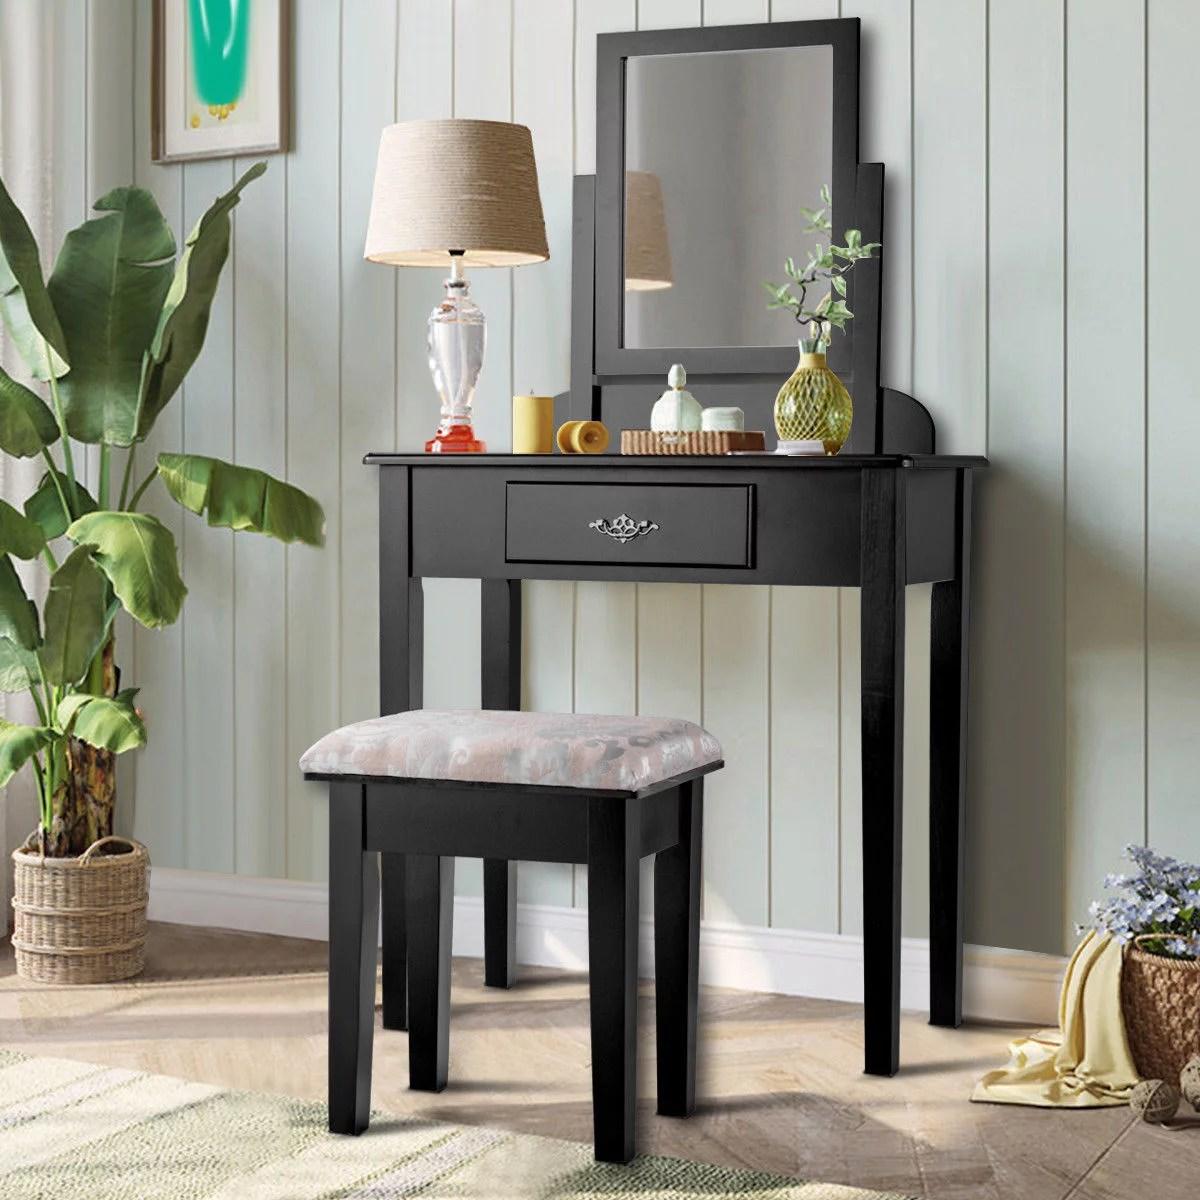 costway makeup desk vanity dressing table square stool 1 large black walmart com